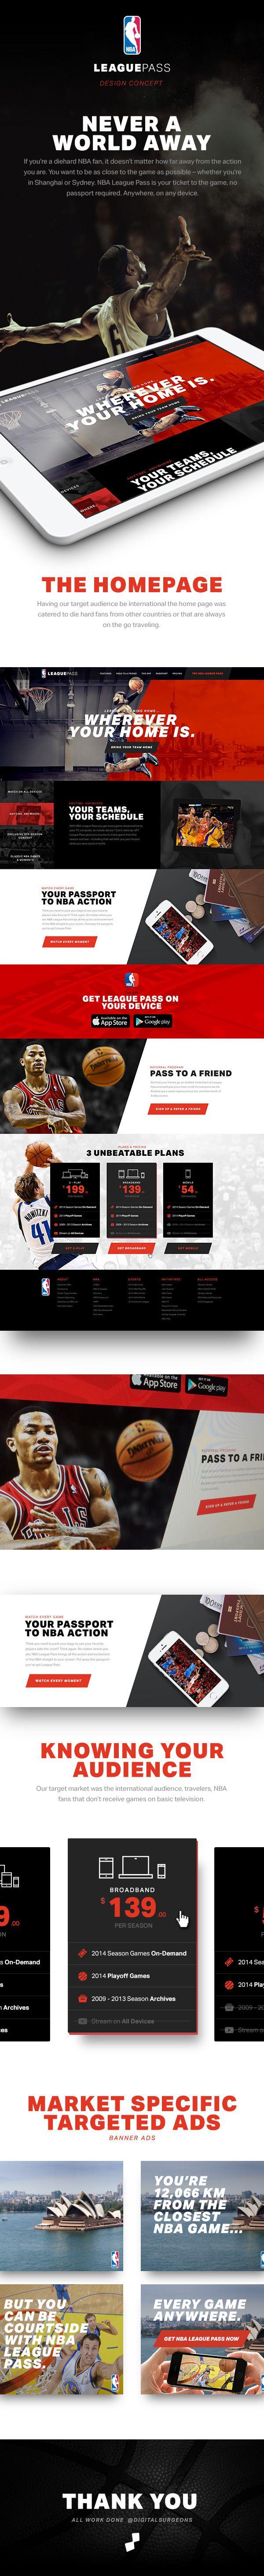 NBA League Pass on Web Design Served